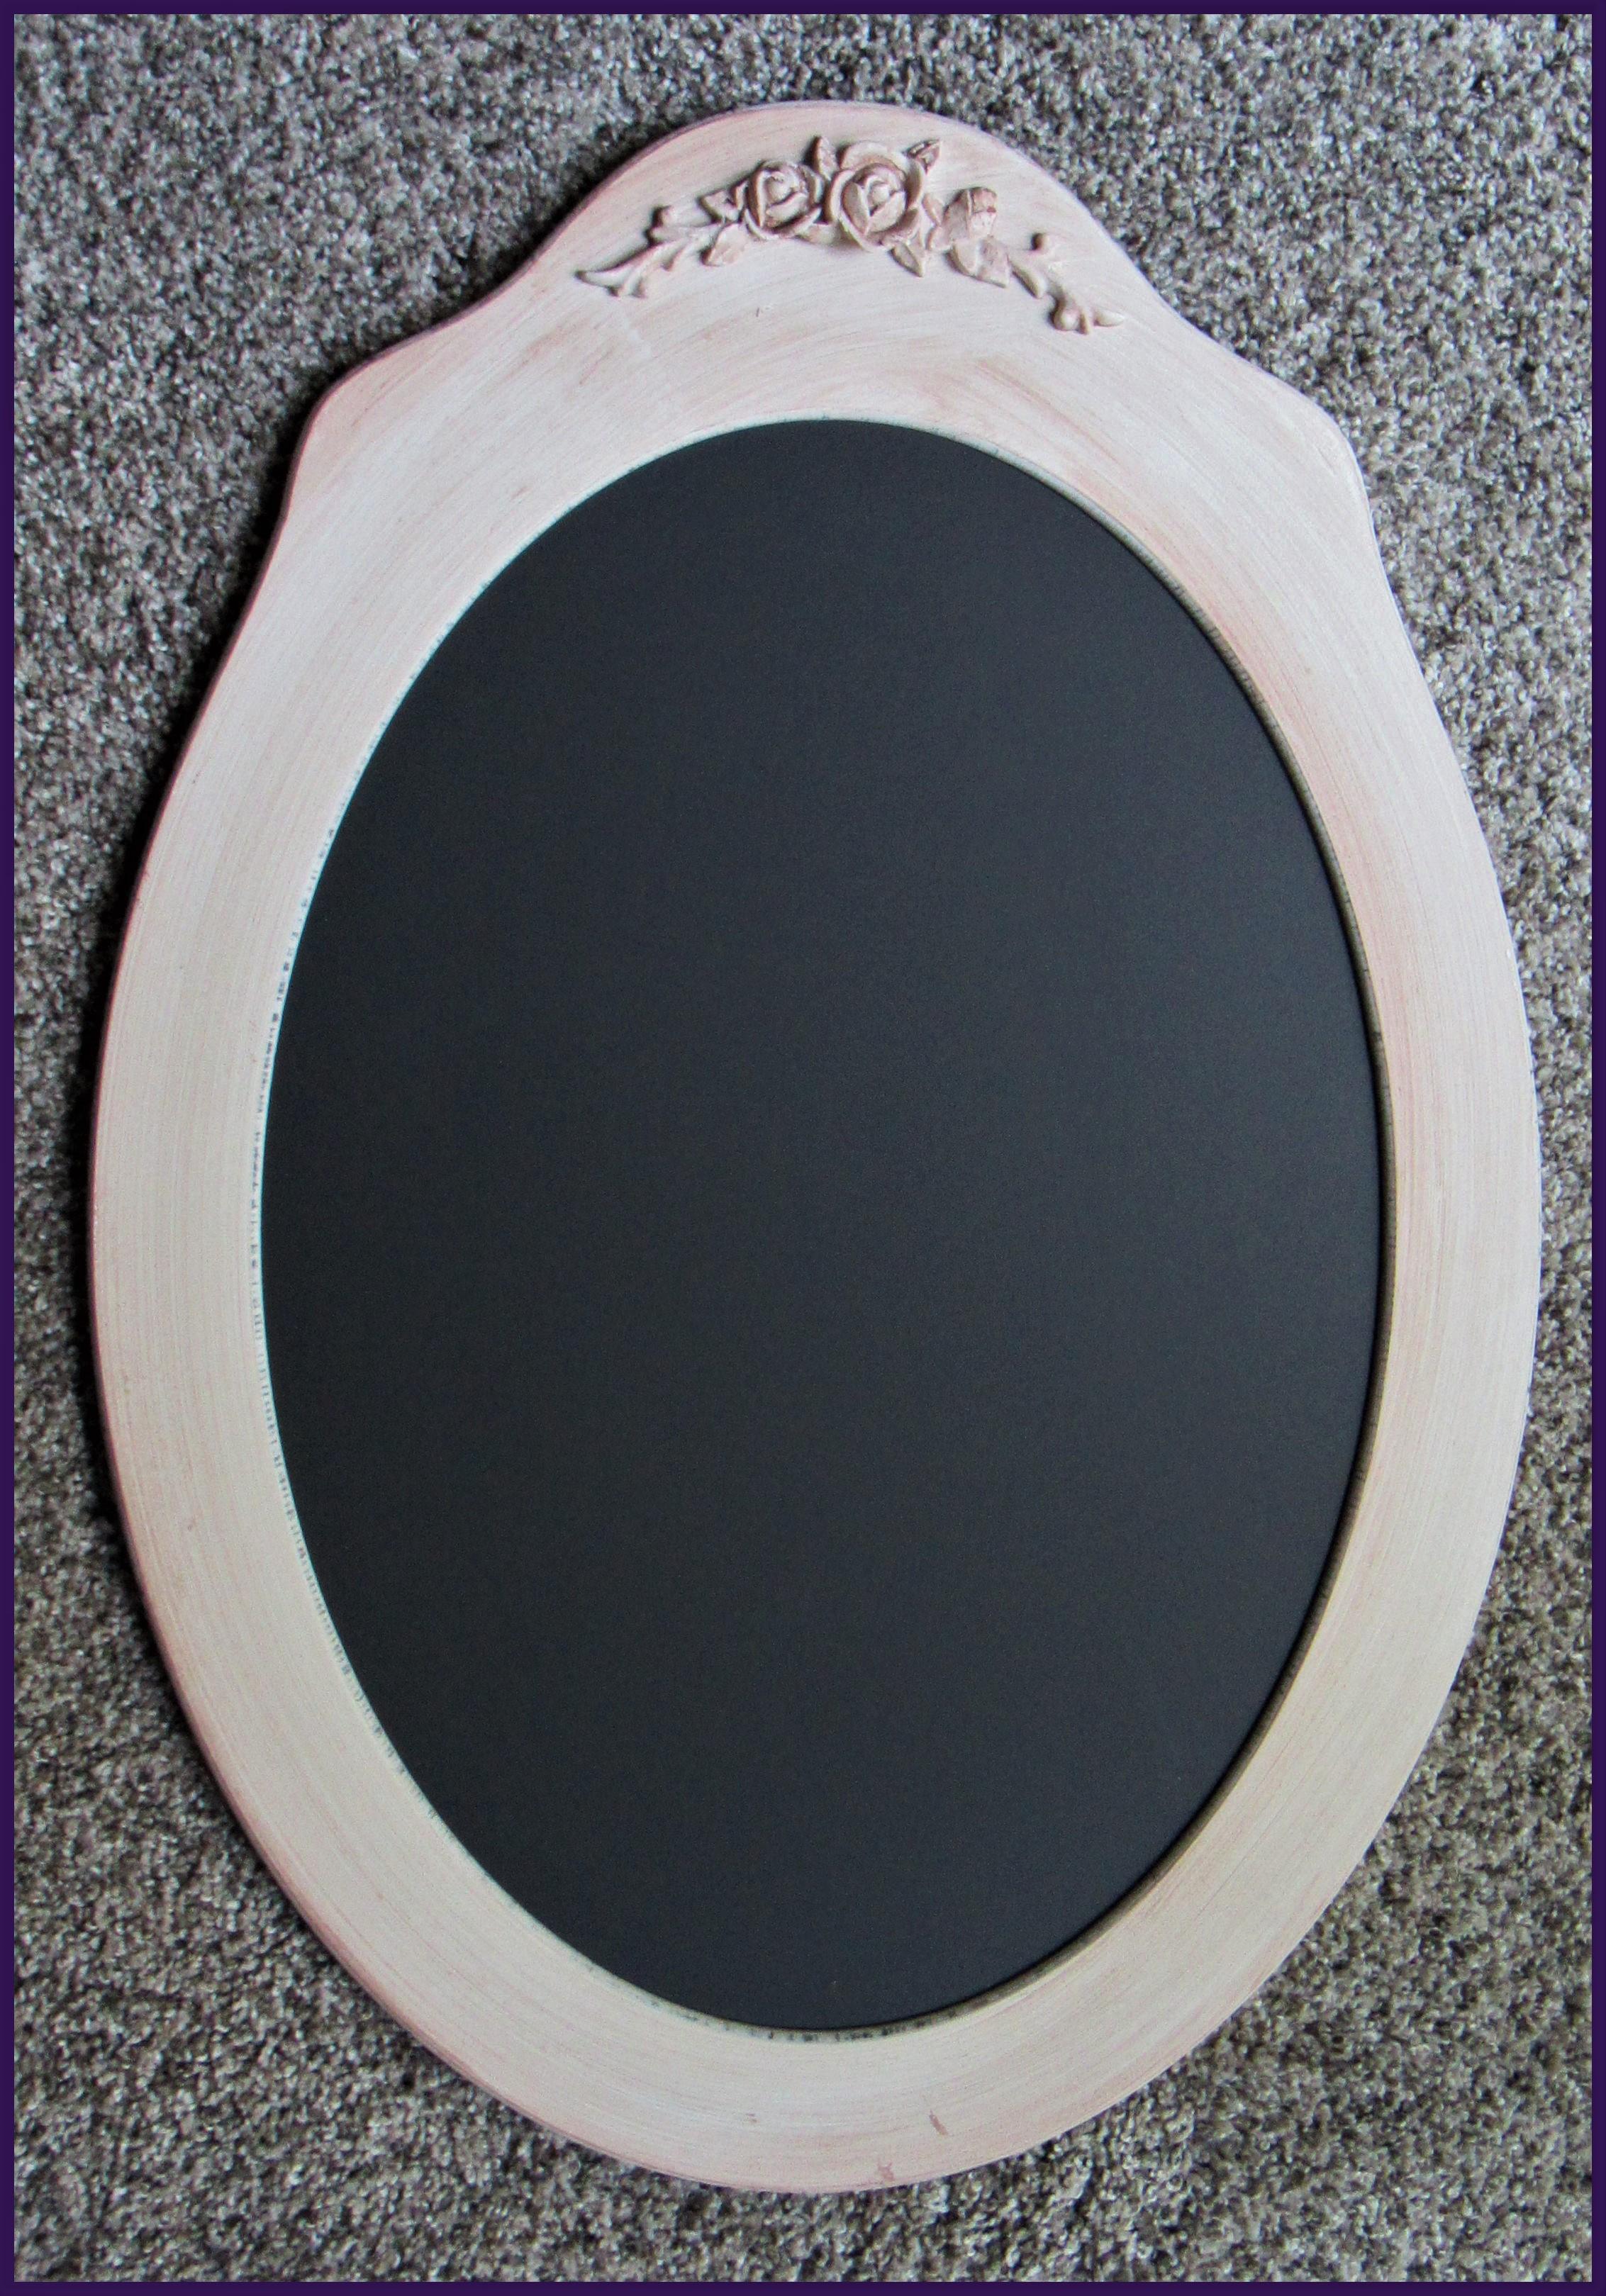 wood-fame-with-insert-21-x-15twa64463.jpg